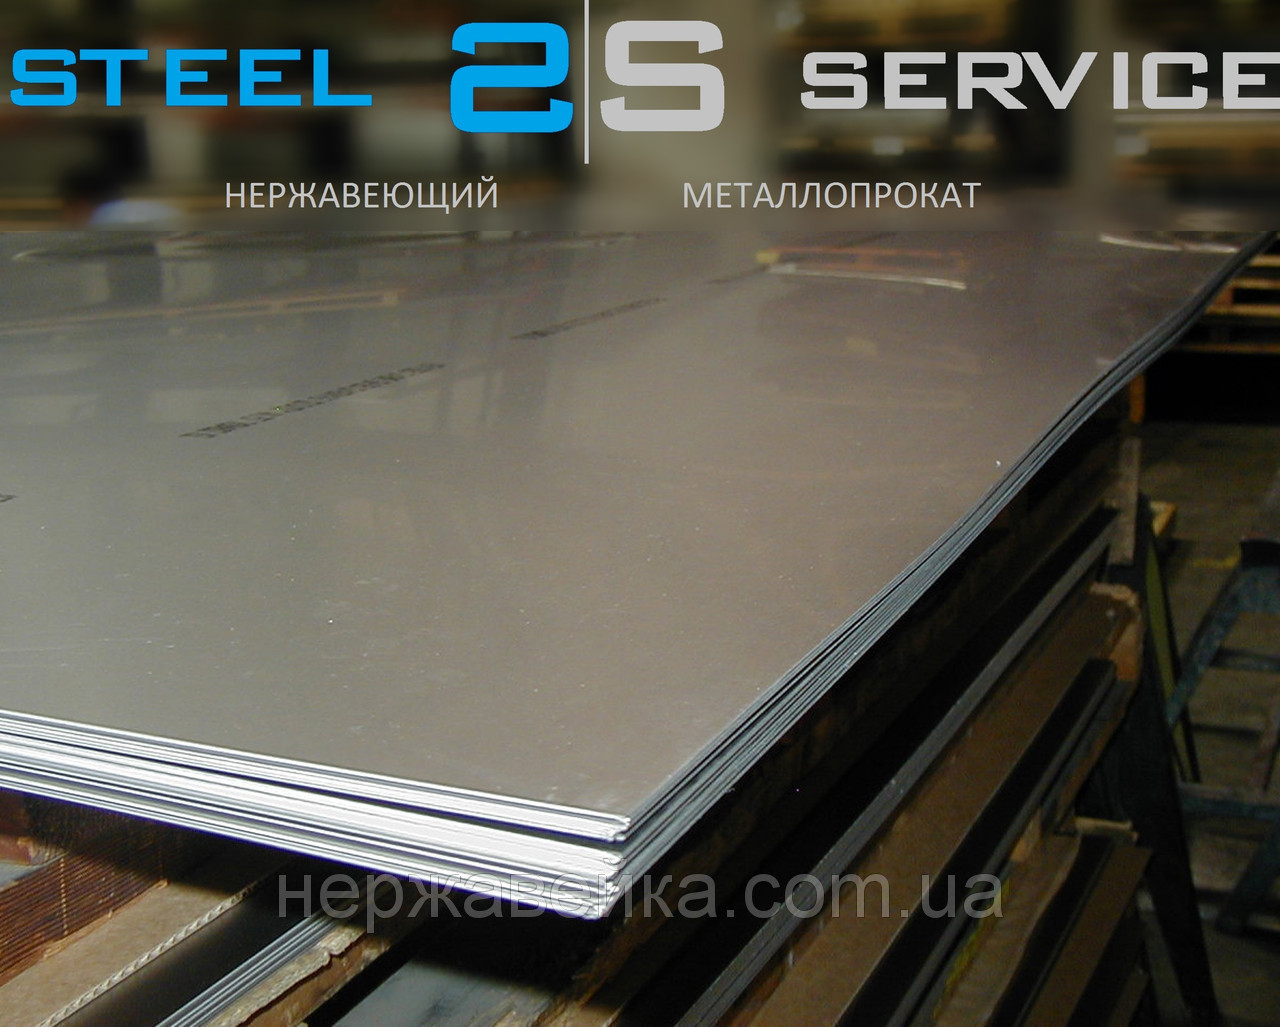 Нержавейка лист 6х1000х2000мм AISI 430(12Х17) 2B - матовый, технический